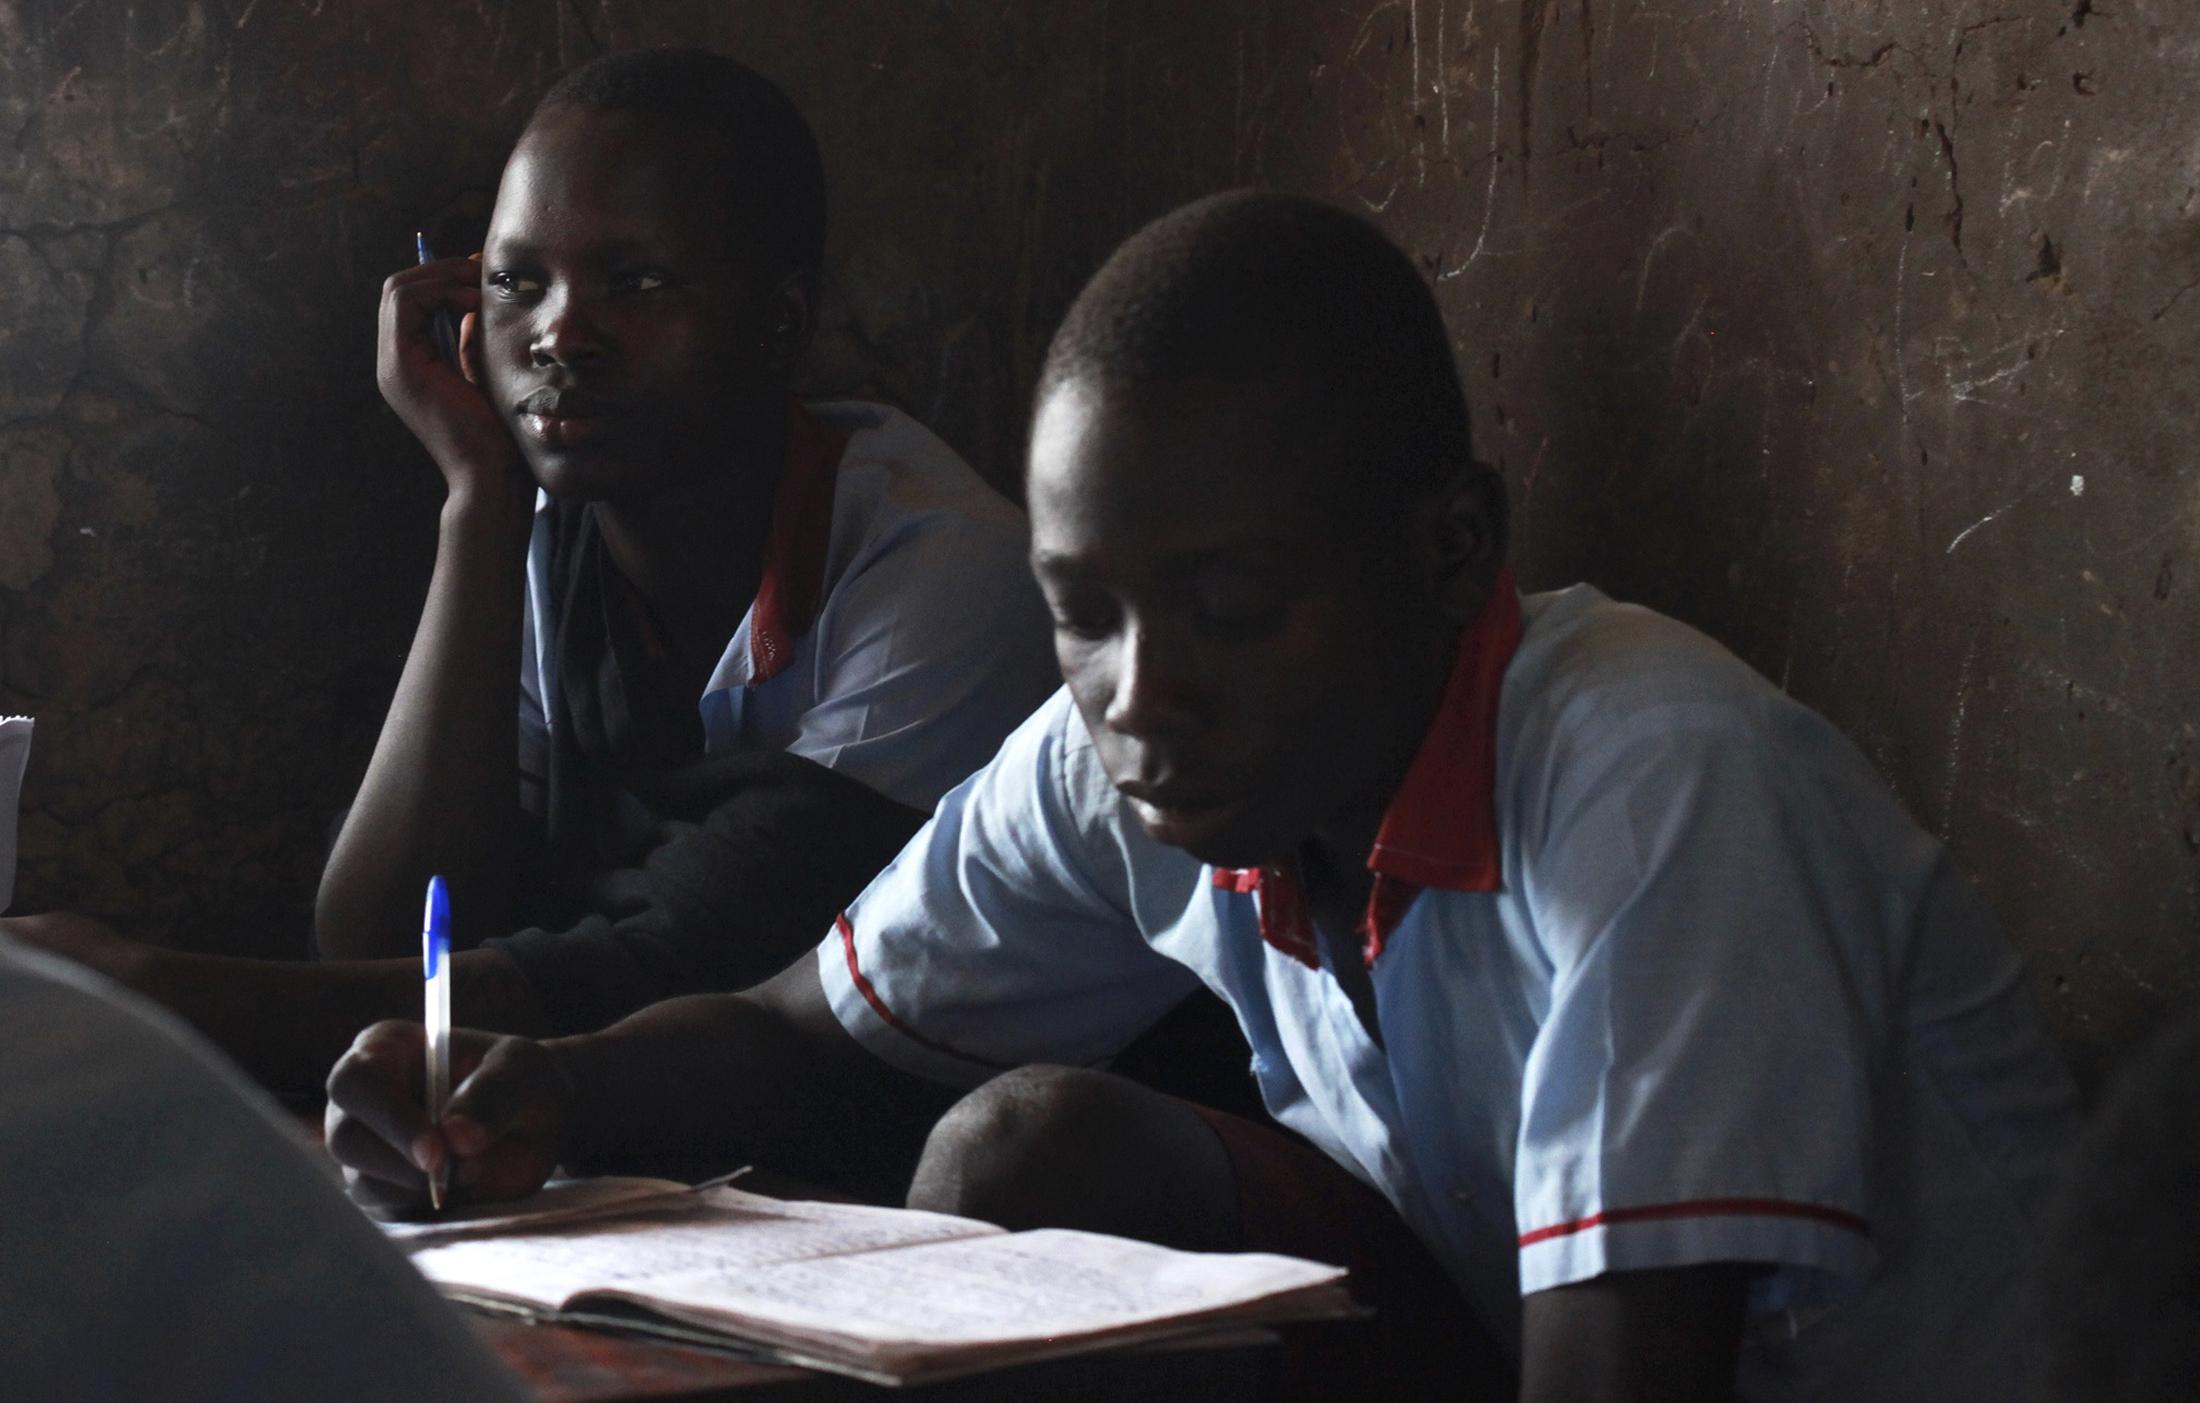 Focusing on Quality Education in sub-Saharan Africa